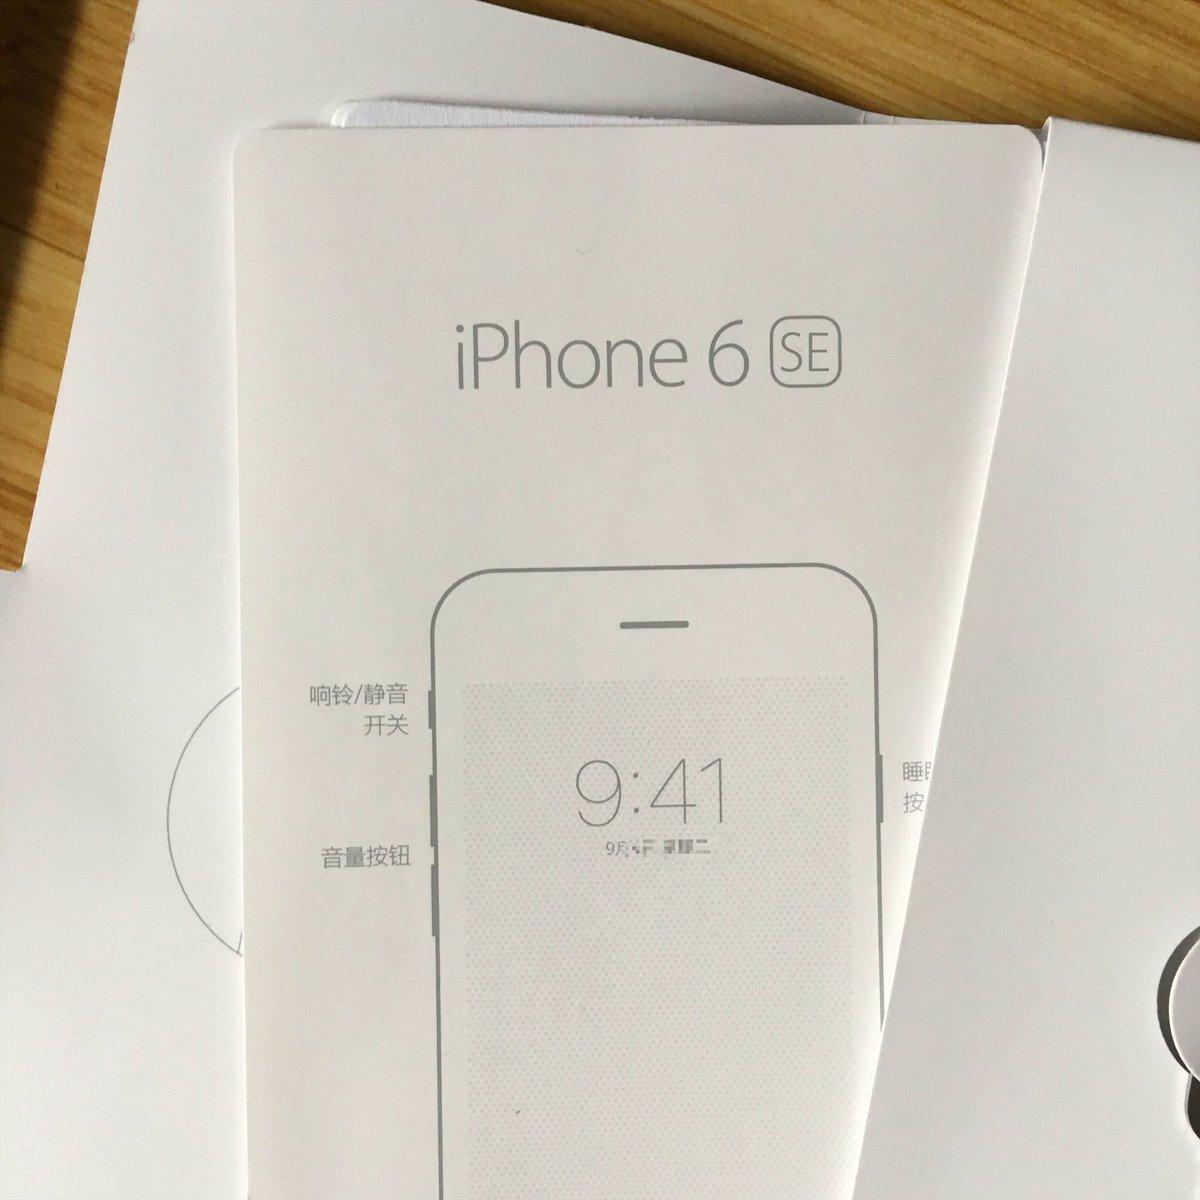 iPhone 6SE box